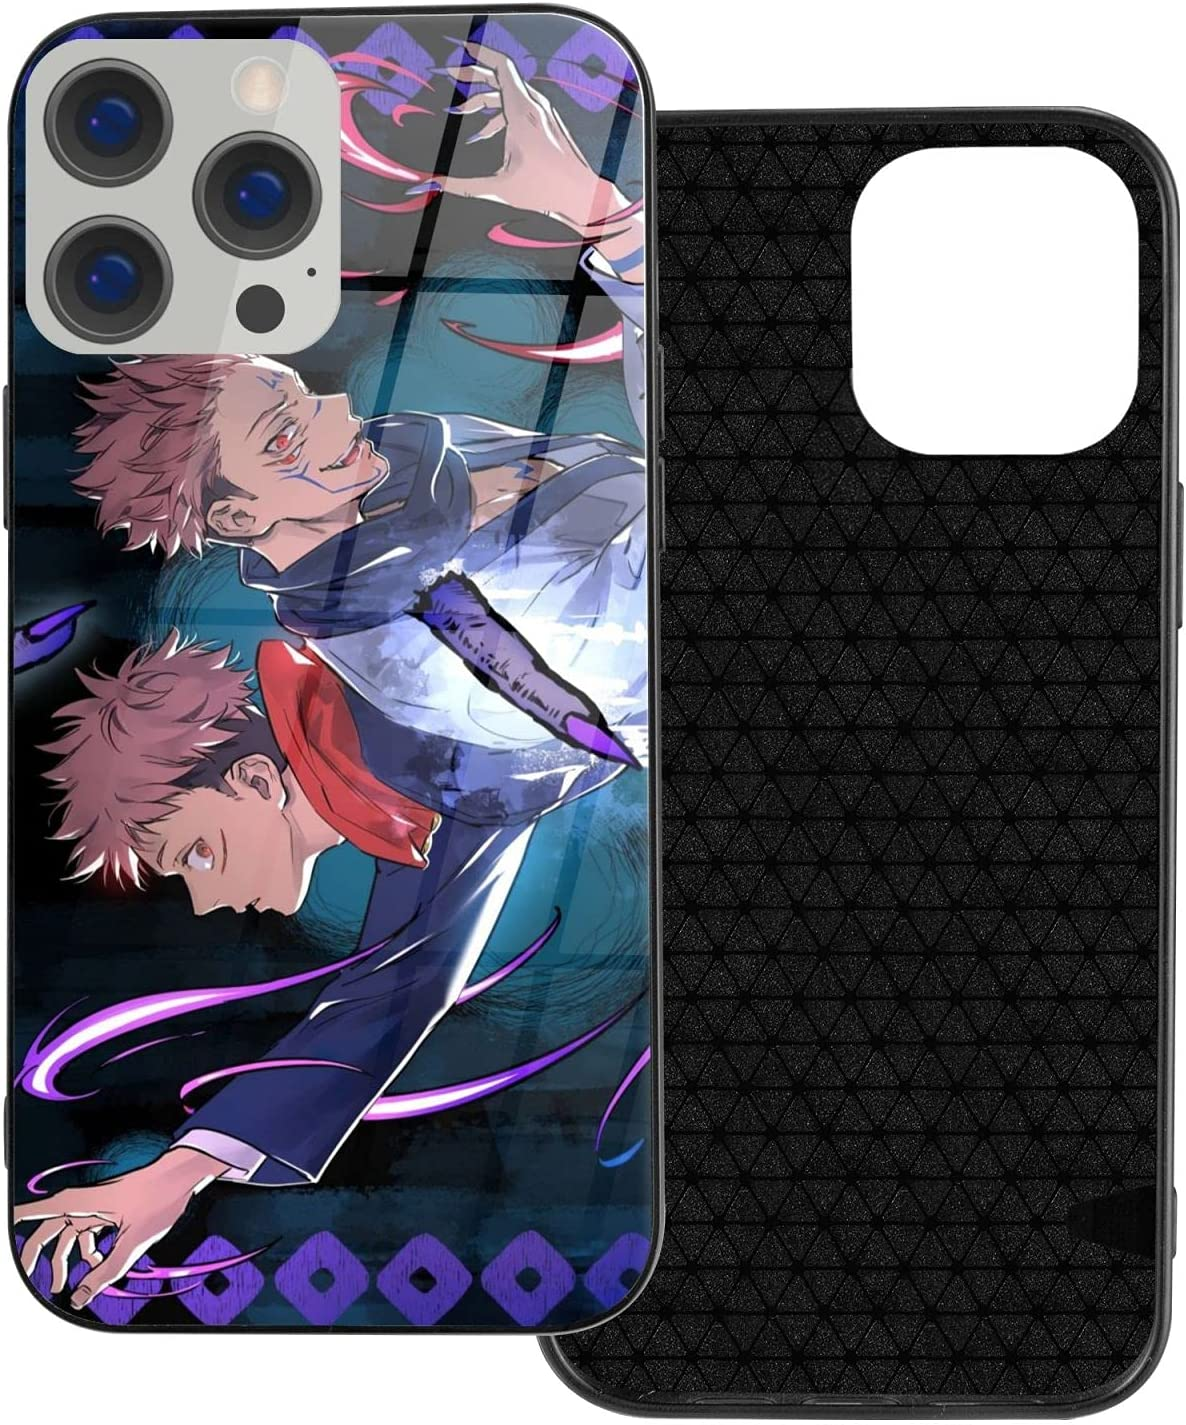 rilixuy Jujutsu Kaisen Glass Shell Phone Case for iPhone 12 Comic Anime Manga Theme Protection Back Cover-2